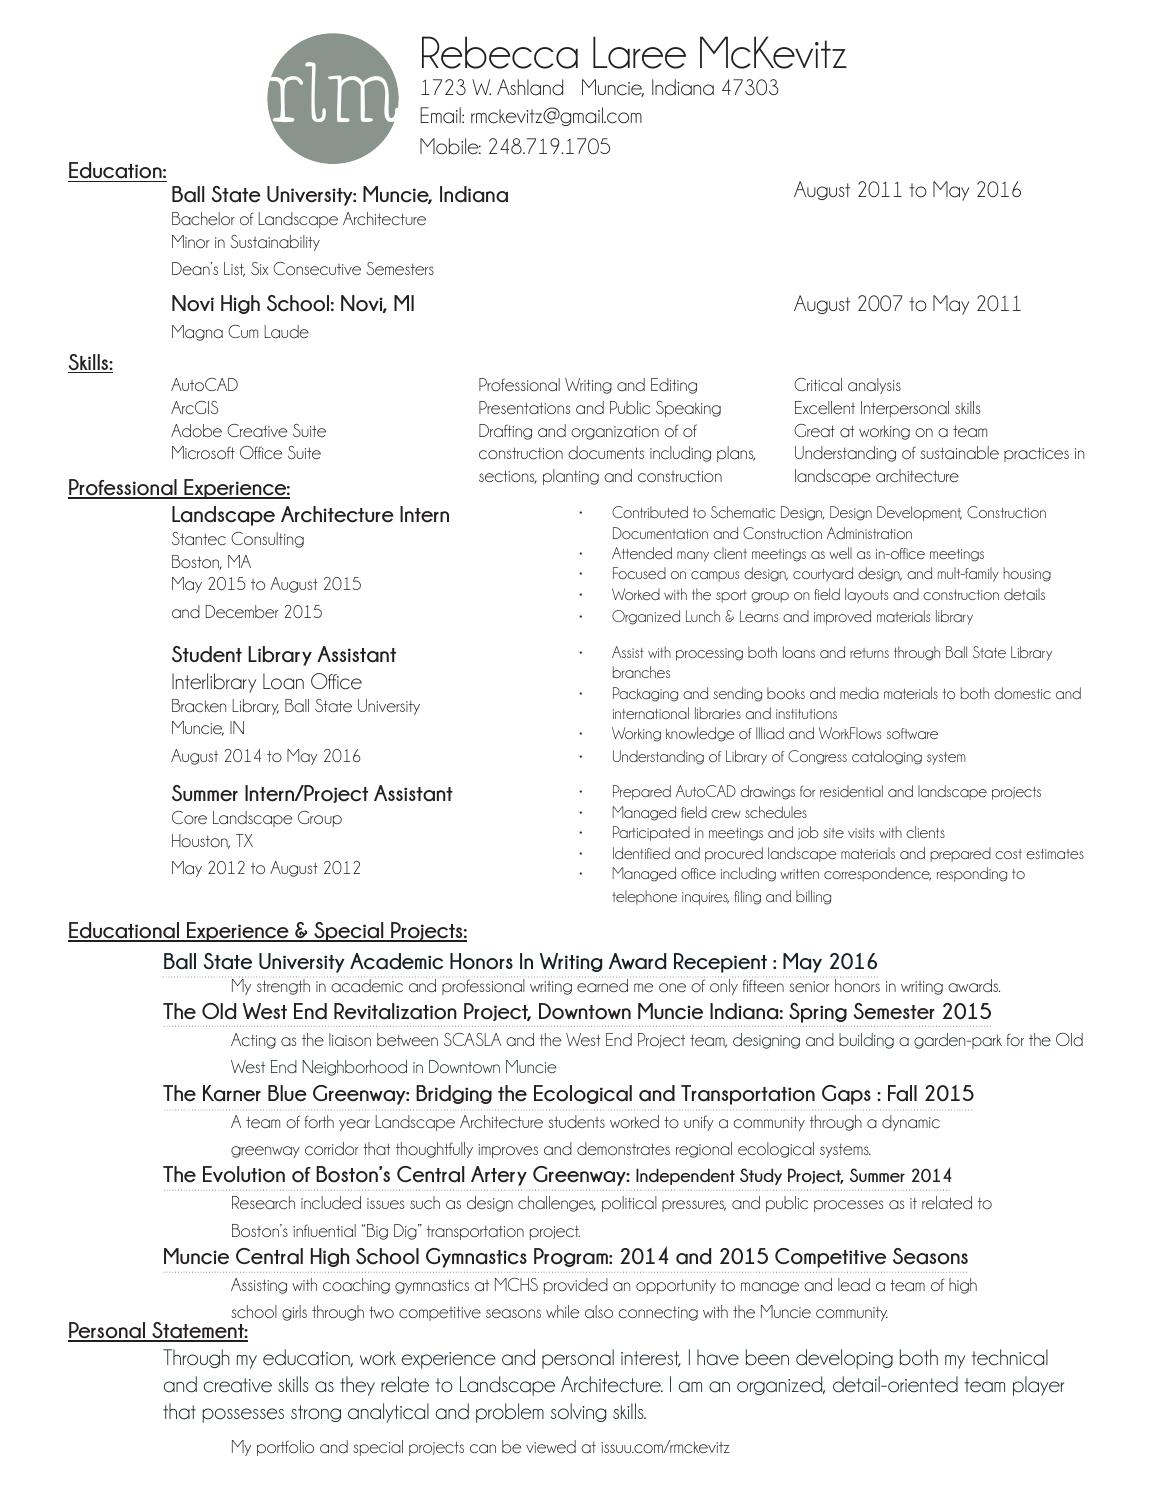 rebecca mckevitz resume by rebecca l  mckevitz